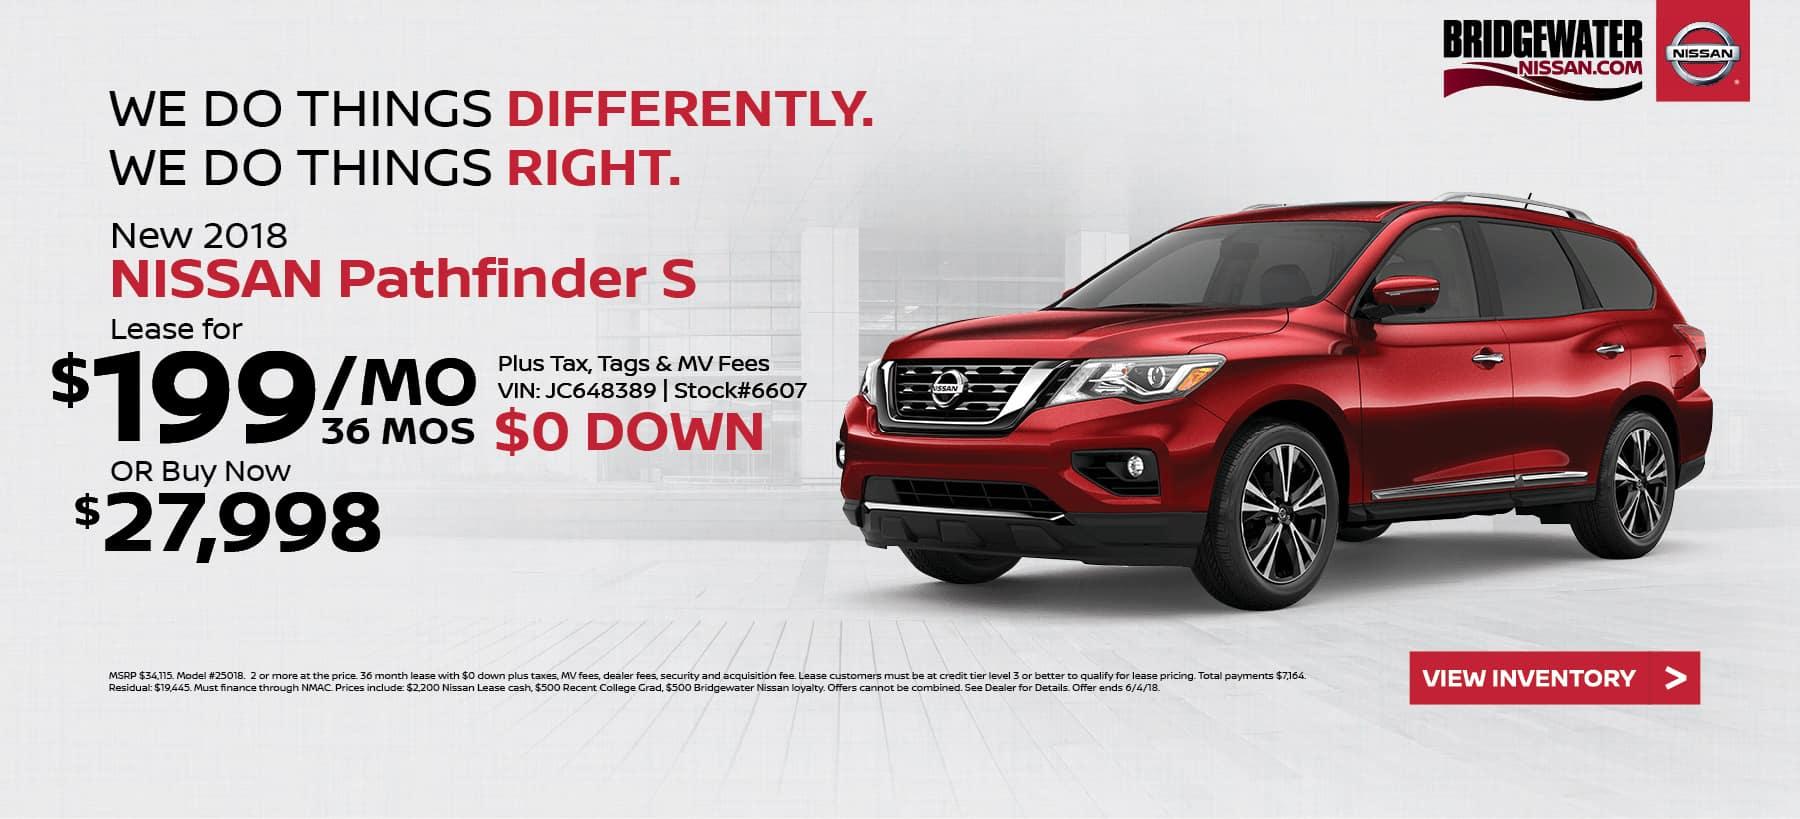 Nissan_Pathfinder Bridgewater Nissan May Homepage Offer